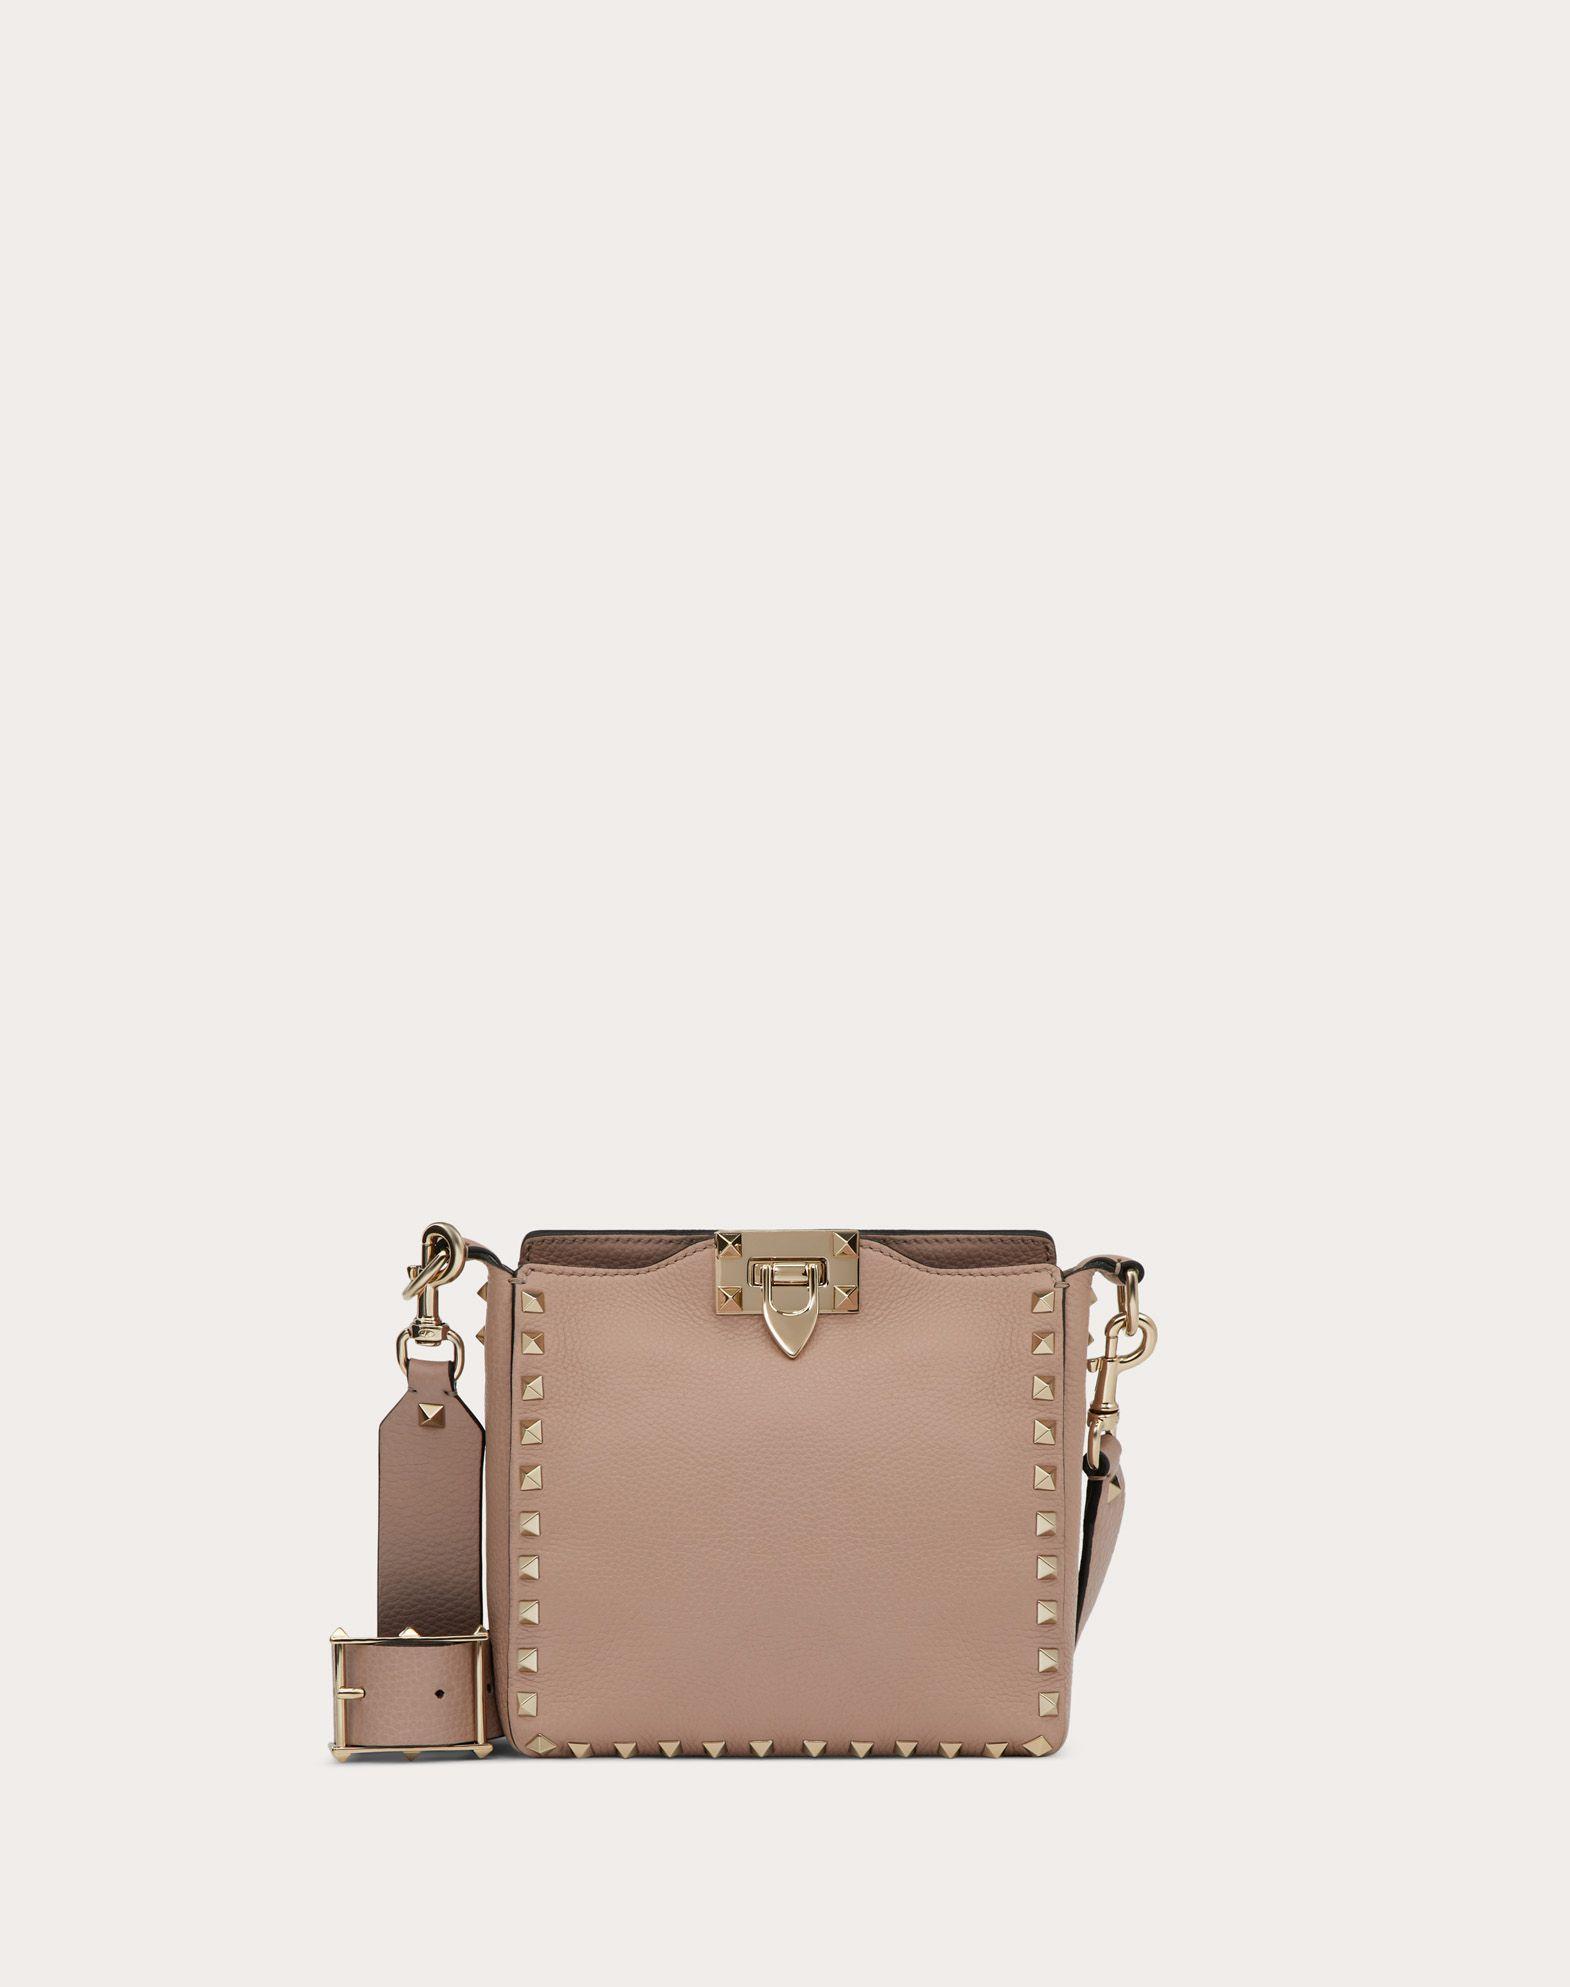 98ca1a8b4c Valentino Rockstud Mini Vitello Stampa Leather Hobo Bag In Light Pink